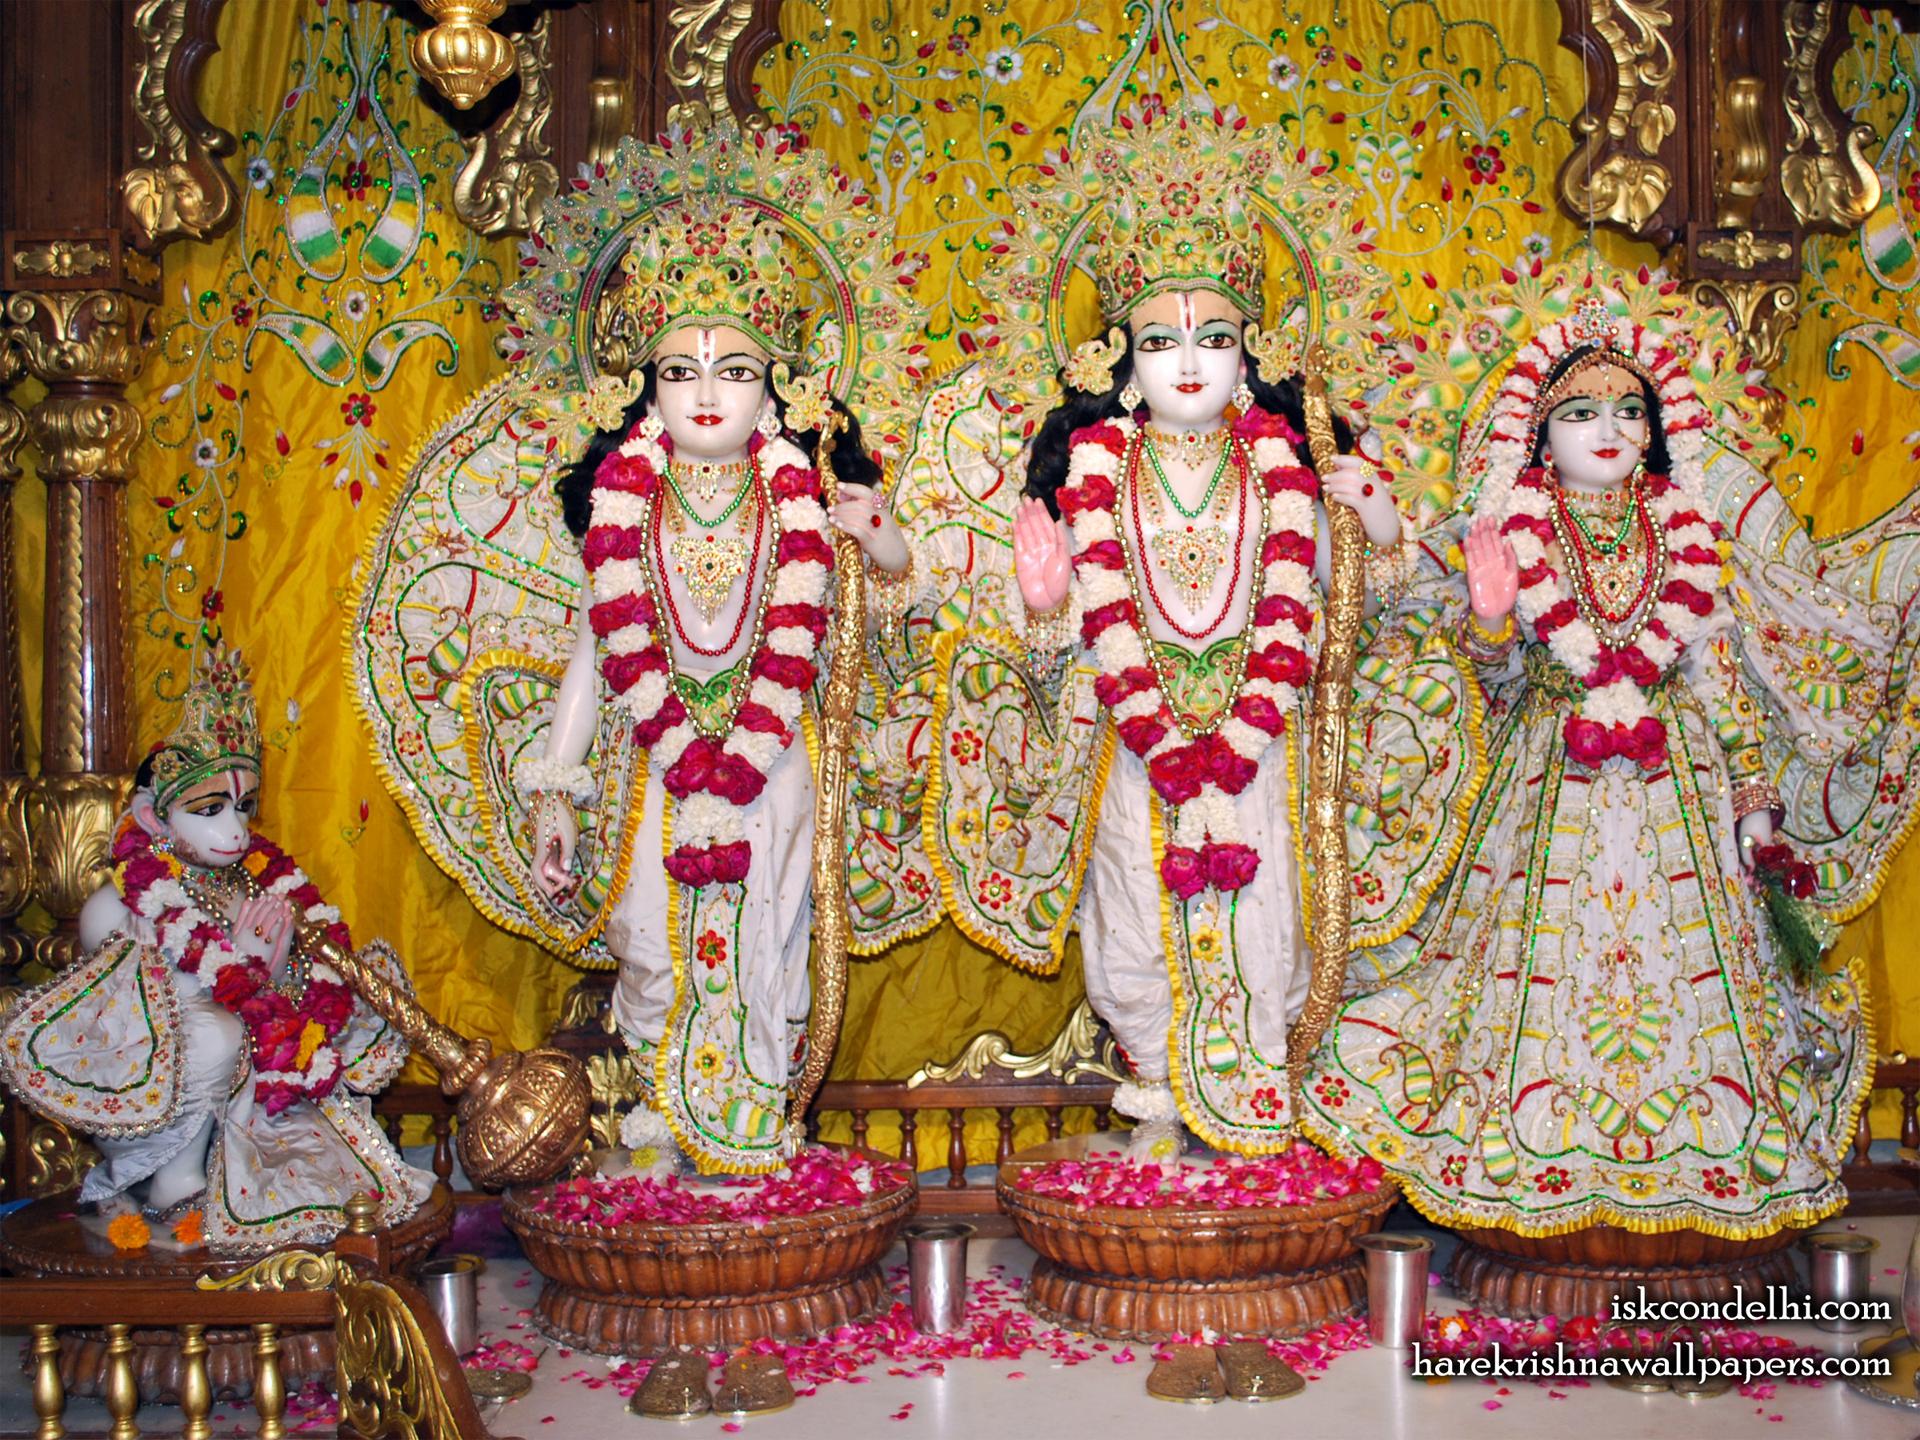 Sri Sri Sita Rama Laxman Hanuman Wallpaper (005) Size 1920x1440 Download